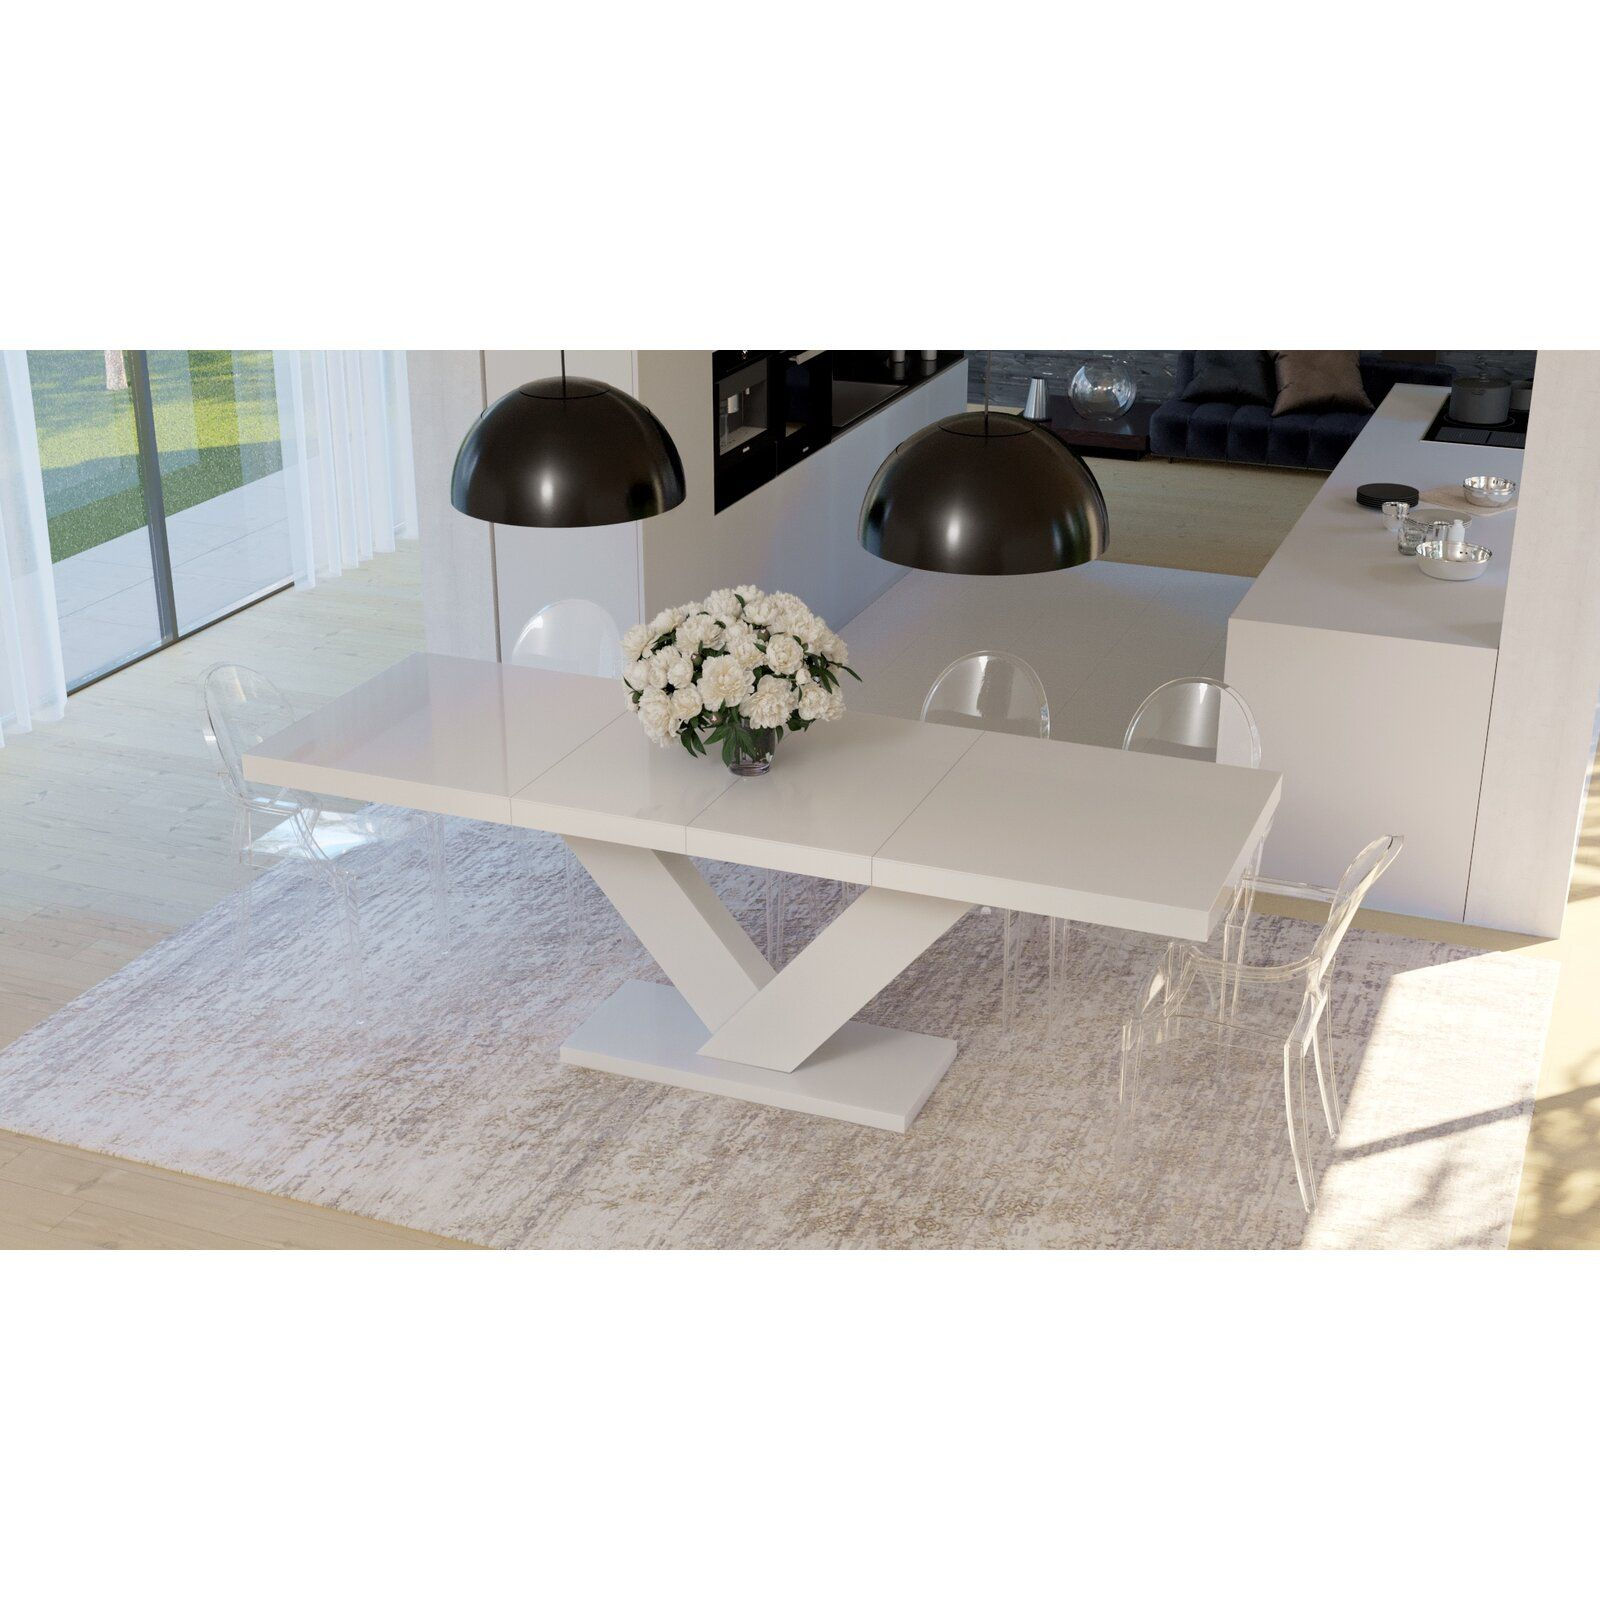 Orren Ellis Cann Extendable Dining Table Wayfair Extendable Dining Table Dining Table Dining Table In Kitchen